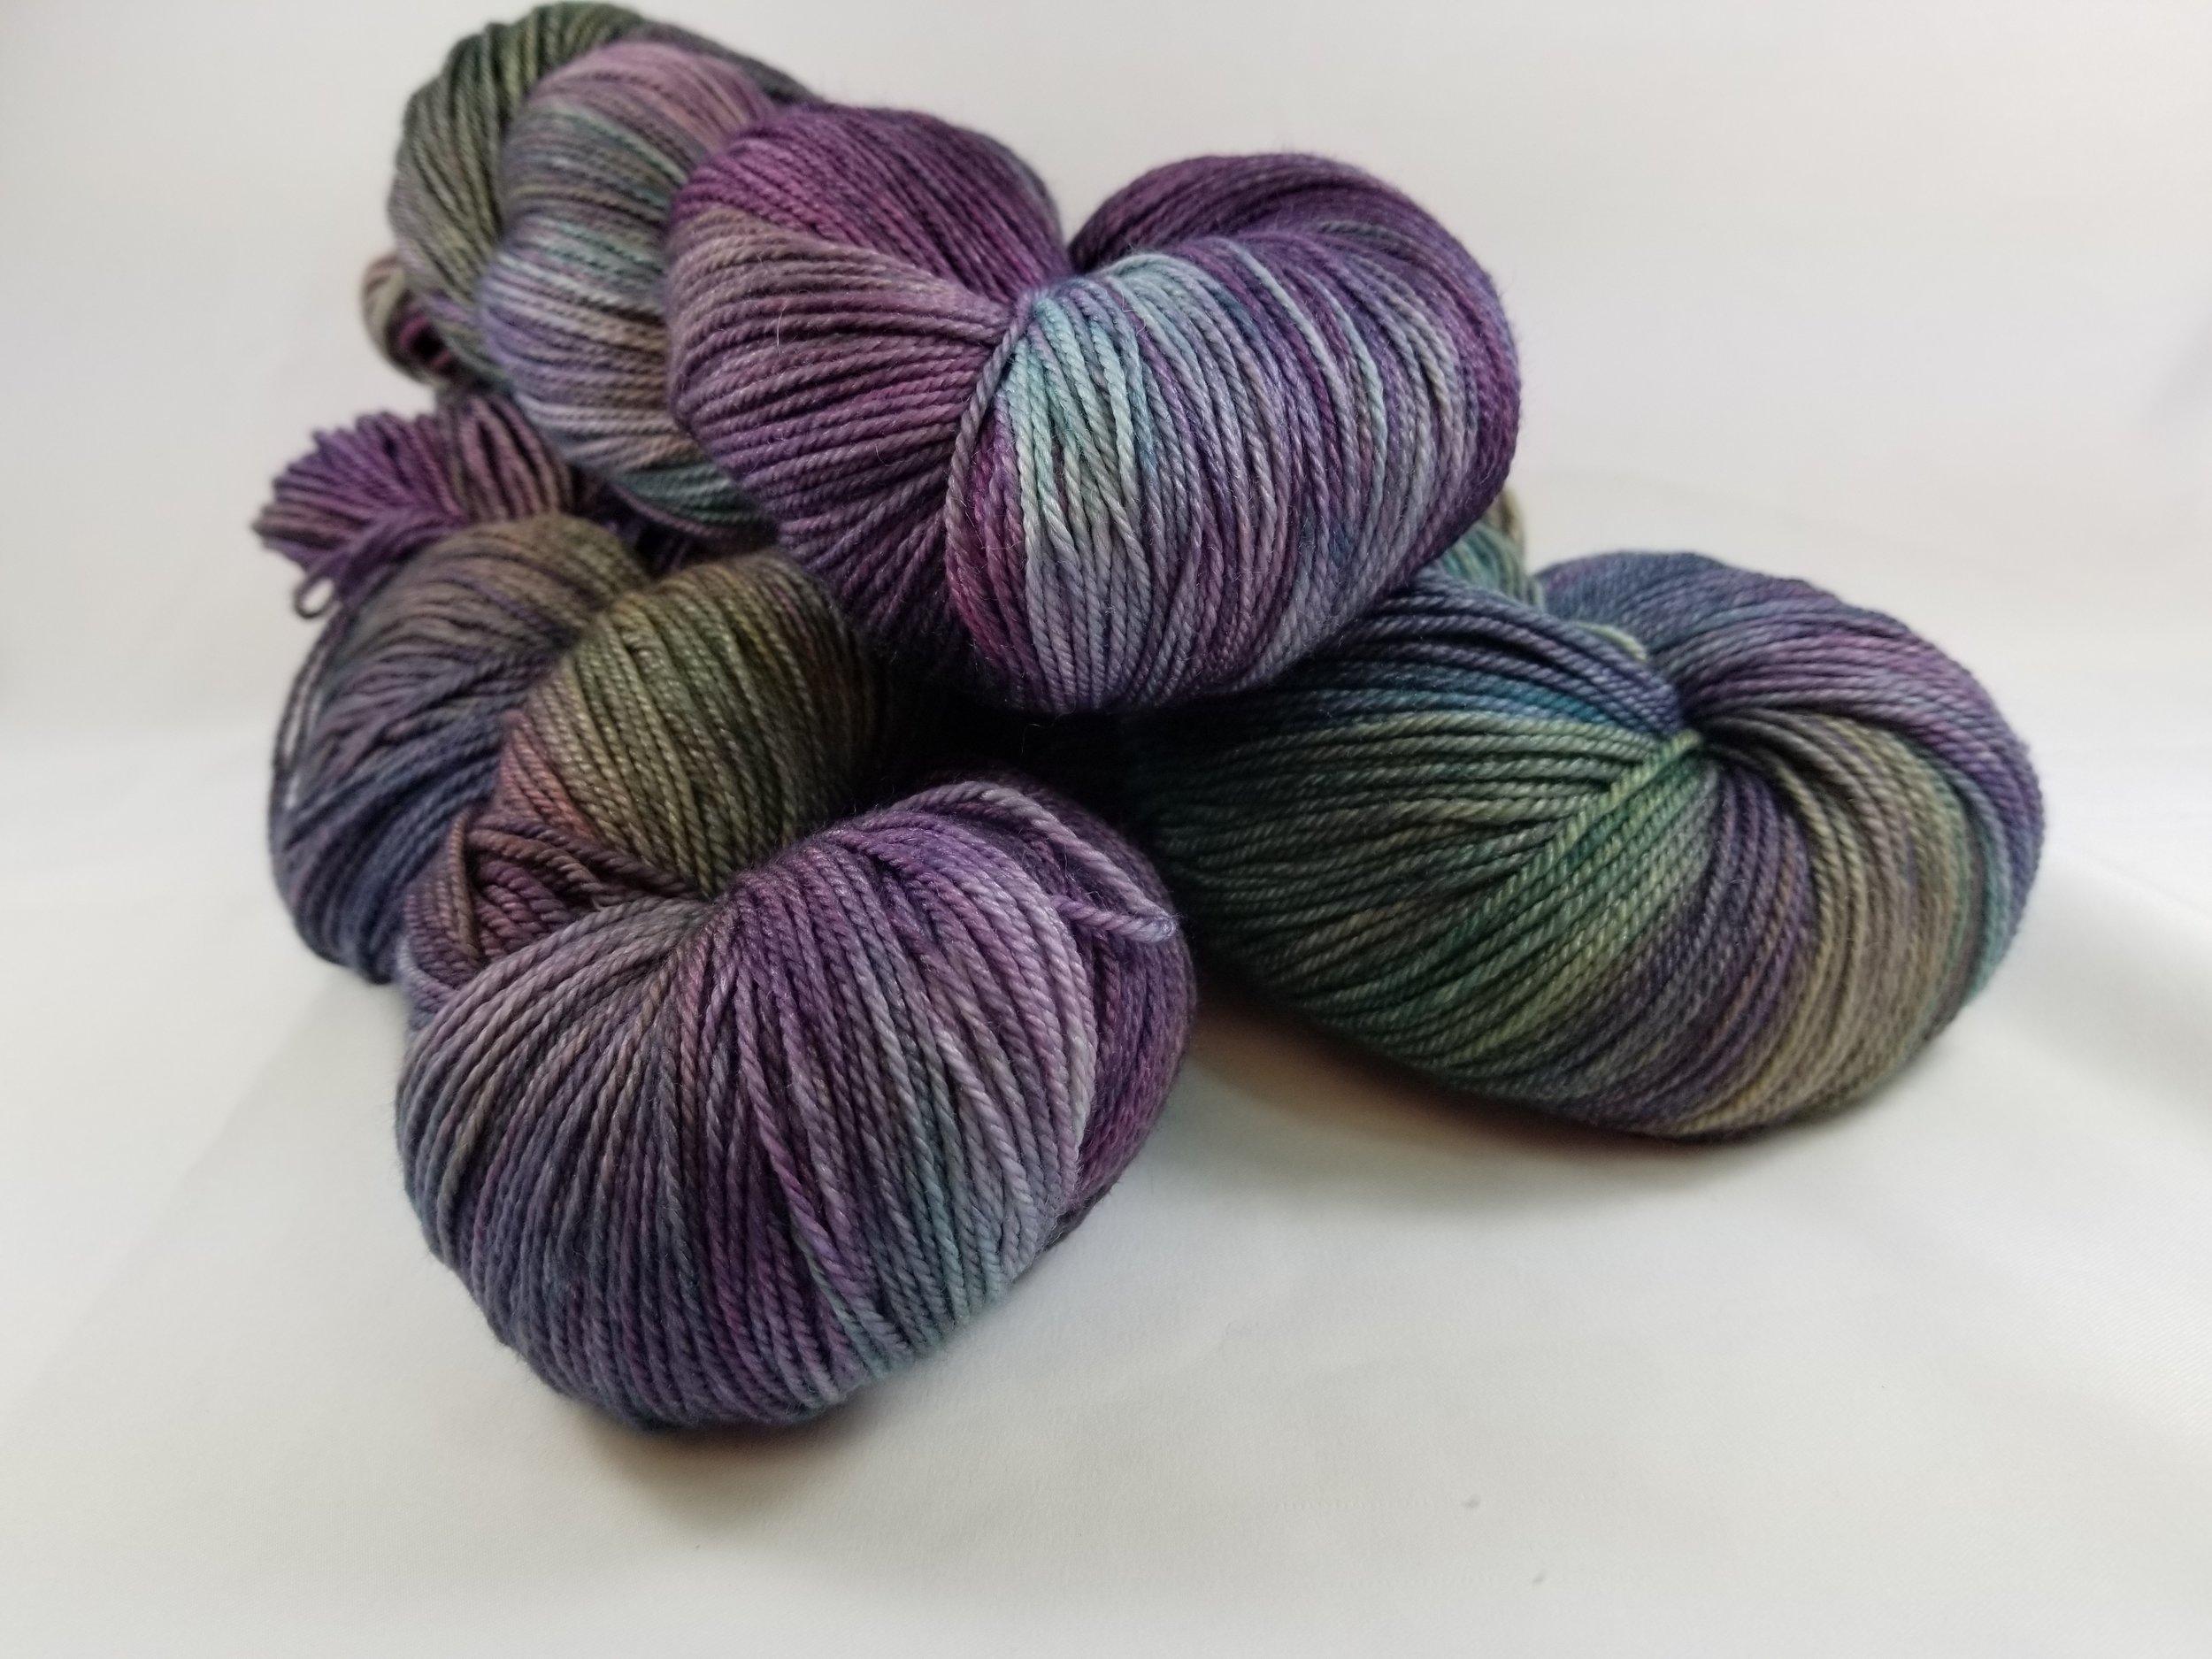 Patina, a fave new color